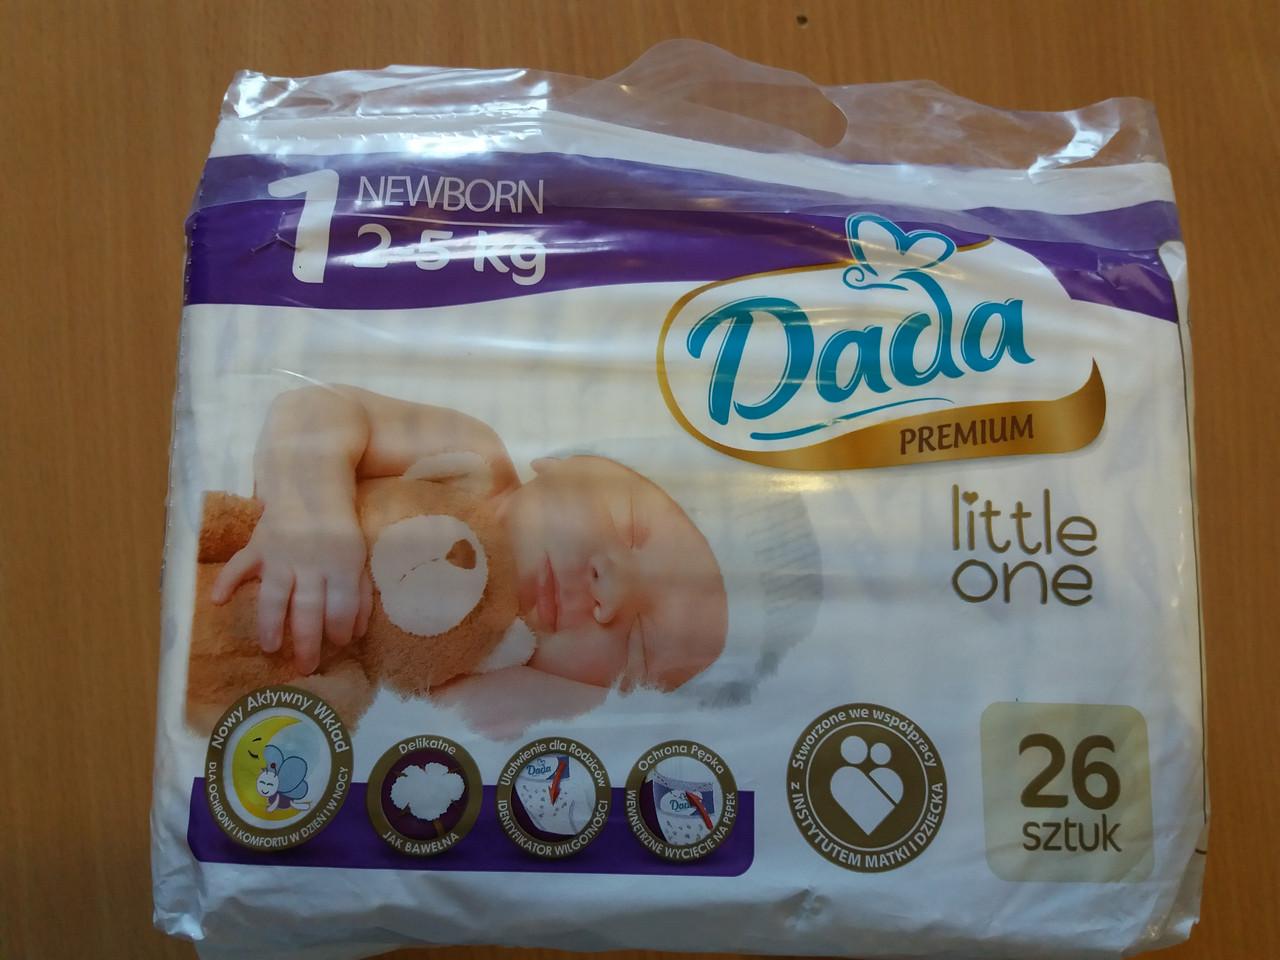 Подгузники Dada Little One 1 Newborn 2-5 кг 26 шт